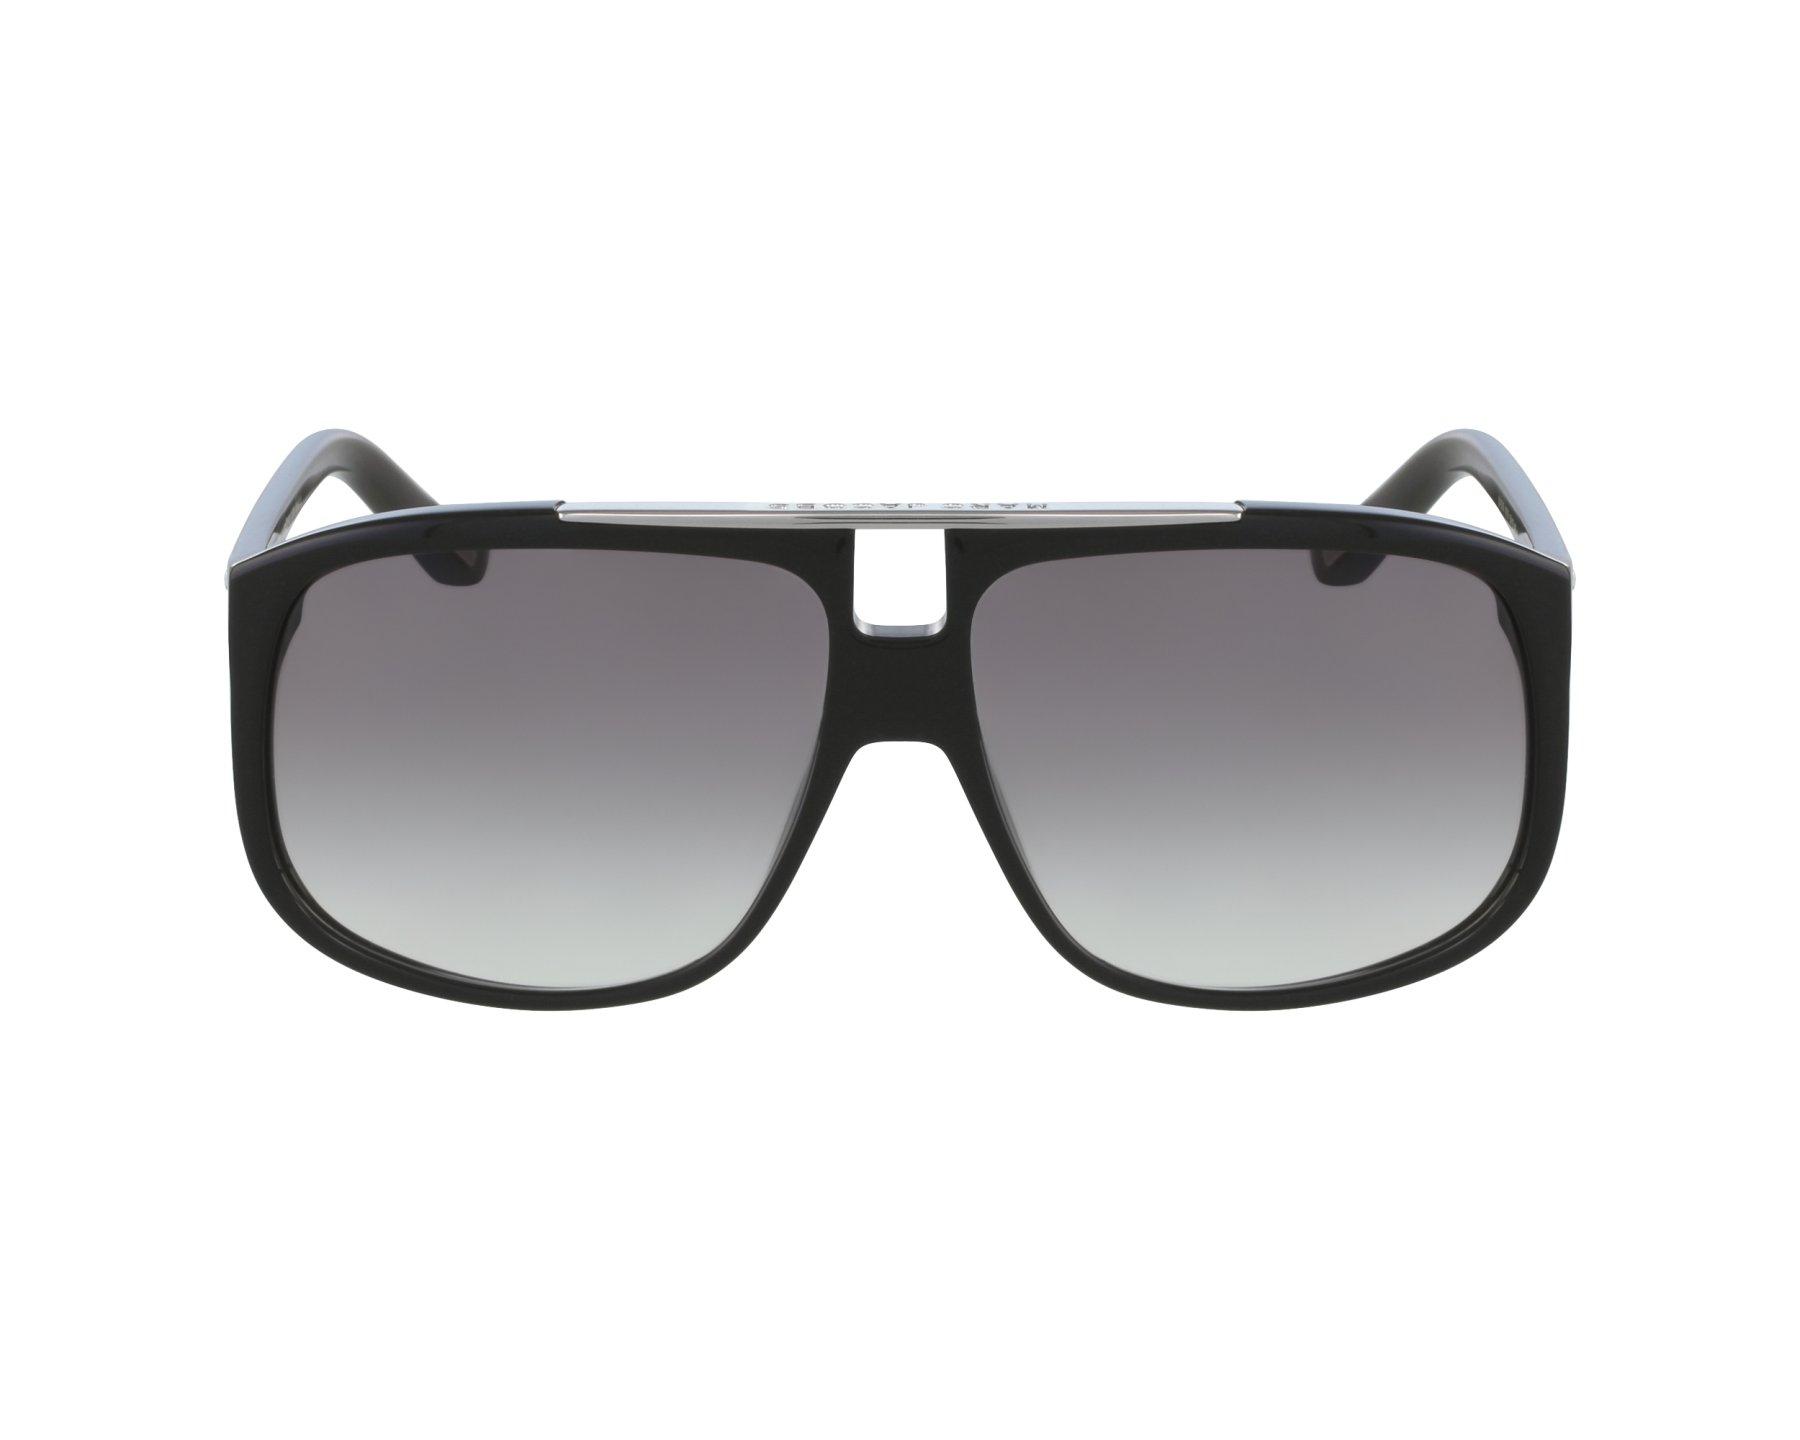 fe37a2c2a134 Sunglasses Marc Jacobs MJ-252-S 807/LF 60-13 Black profile